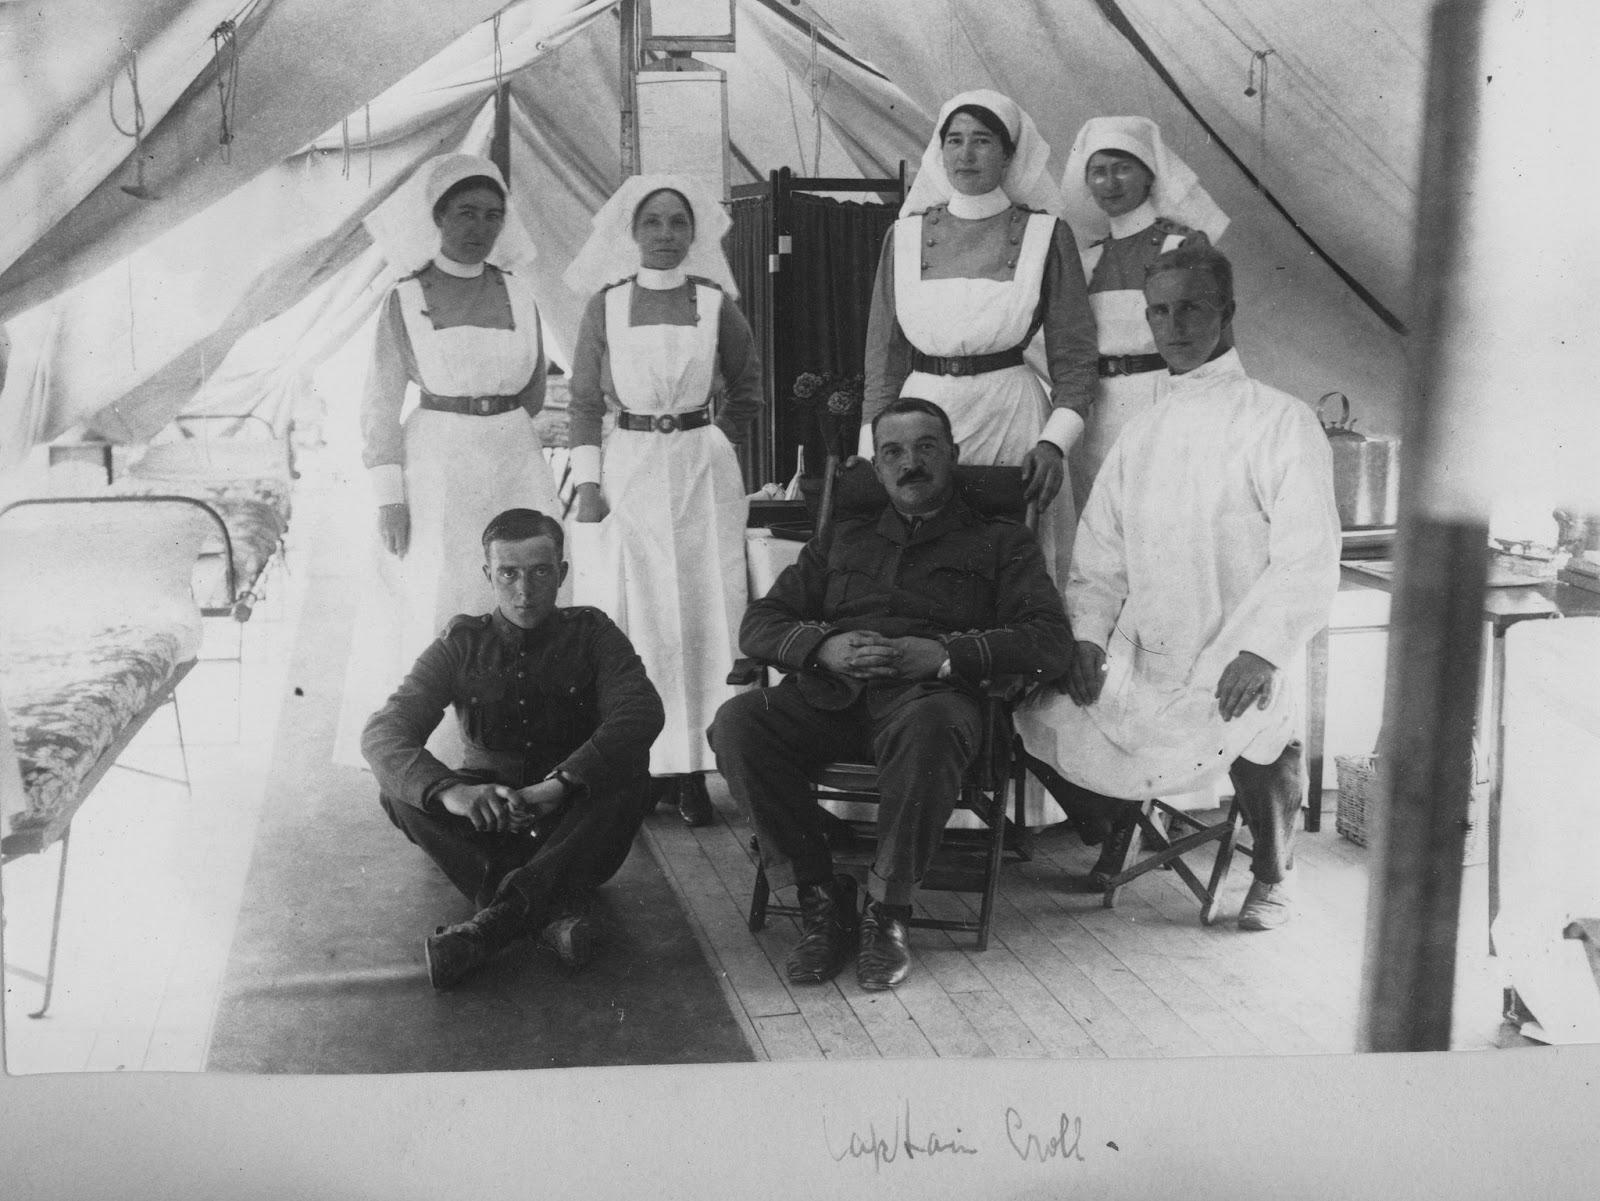 Olive tree genealogy blog november 2015 nursing sister ww1 photo album 31v captain croll fandeluxe Choice Image